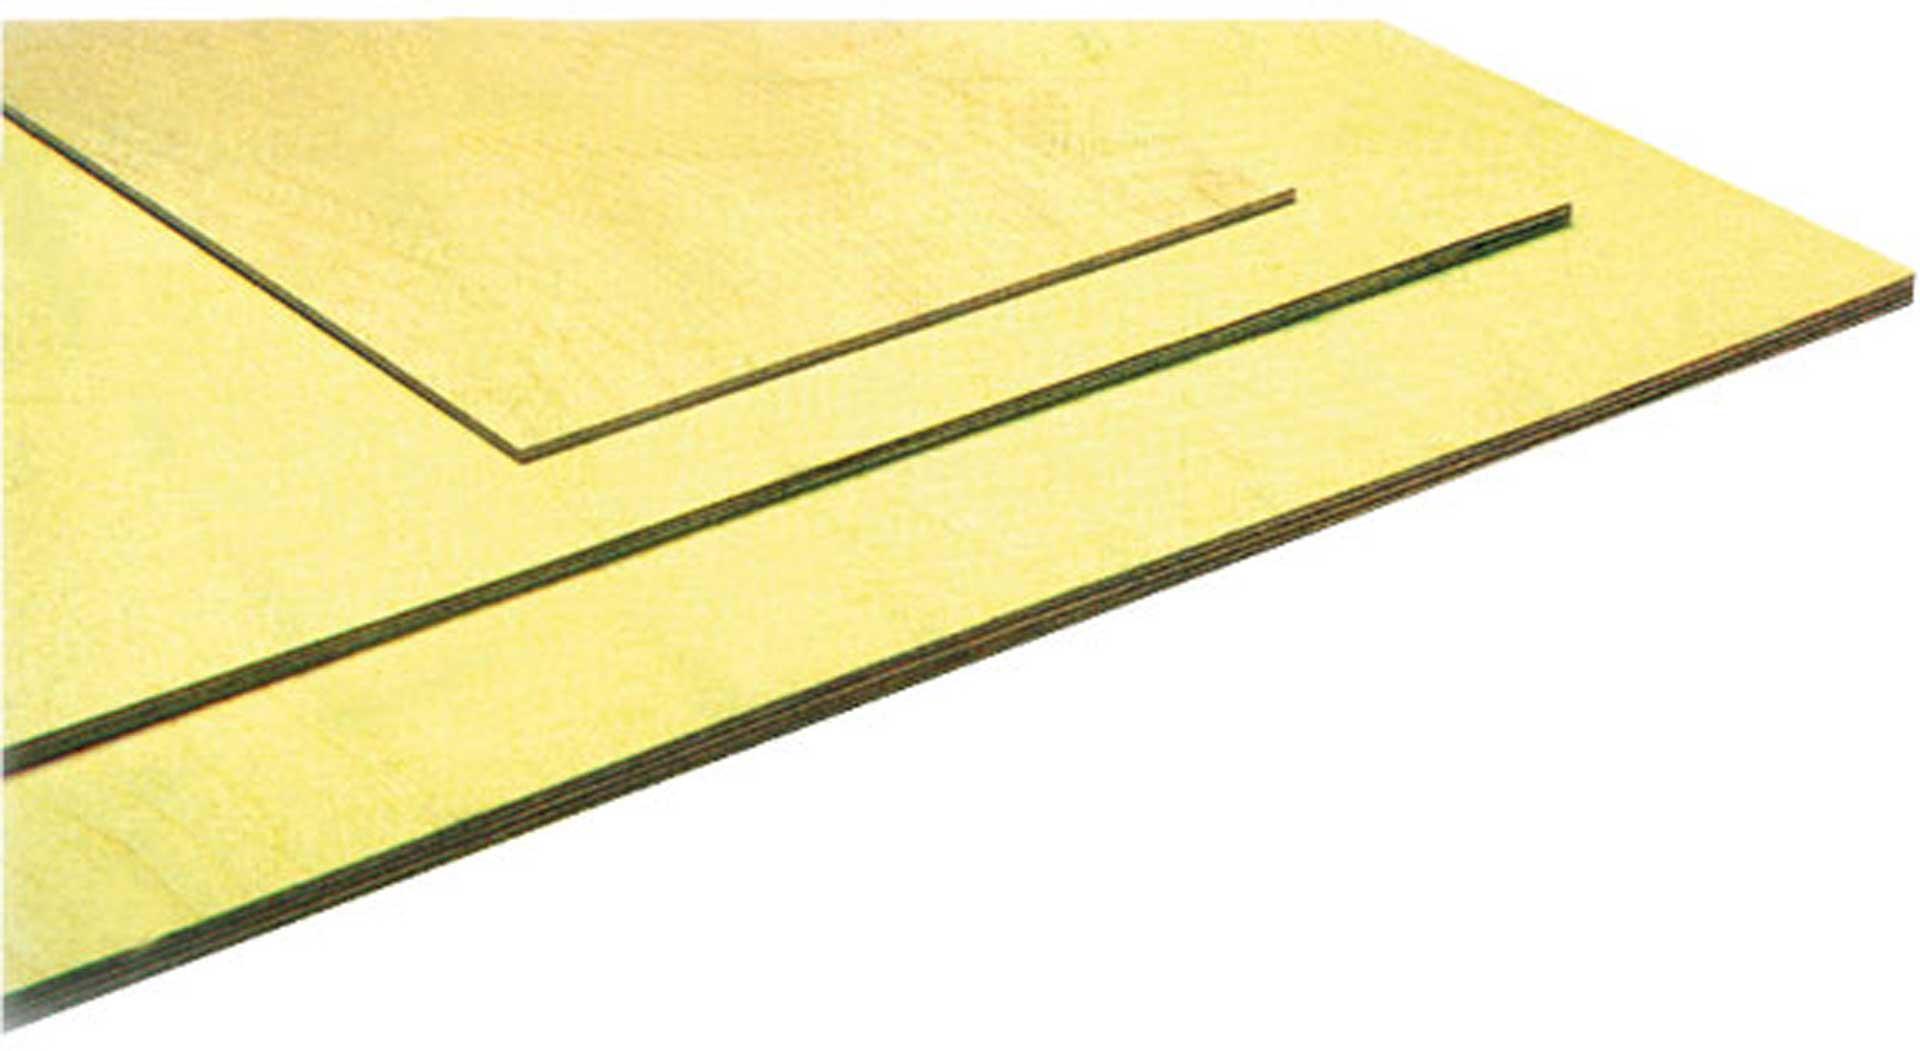 MODELLBAU LINDINGER BIRCH-SPERRY 0,8/300/500MM